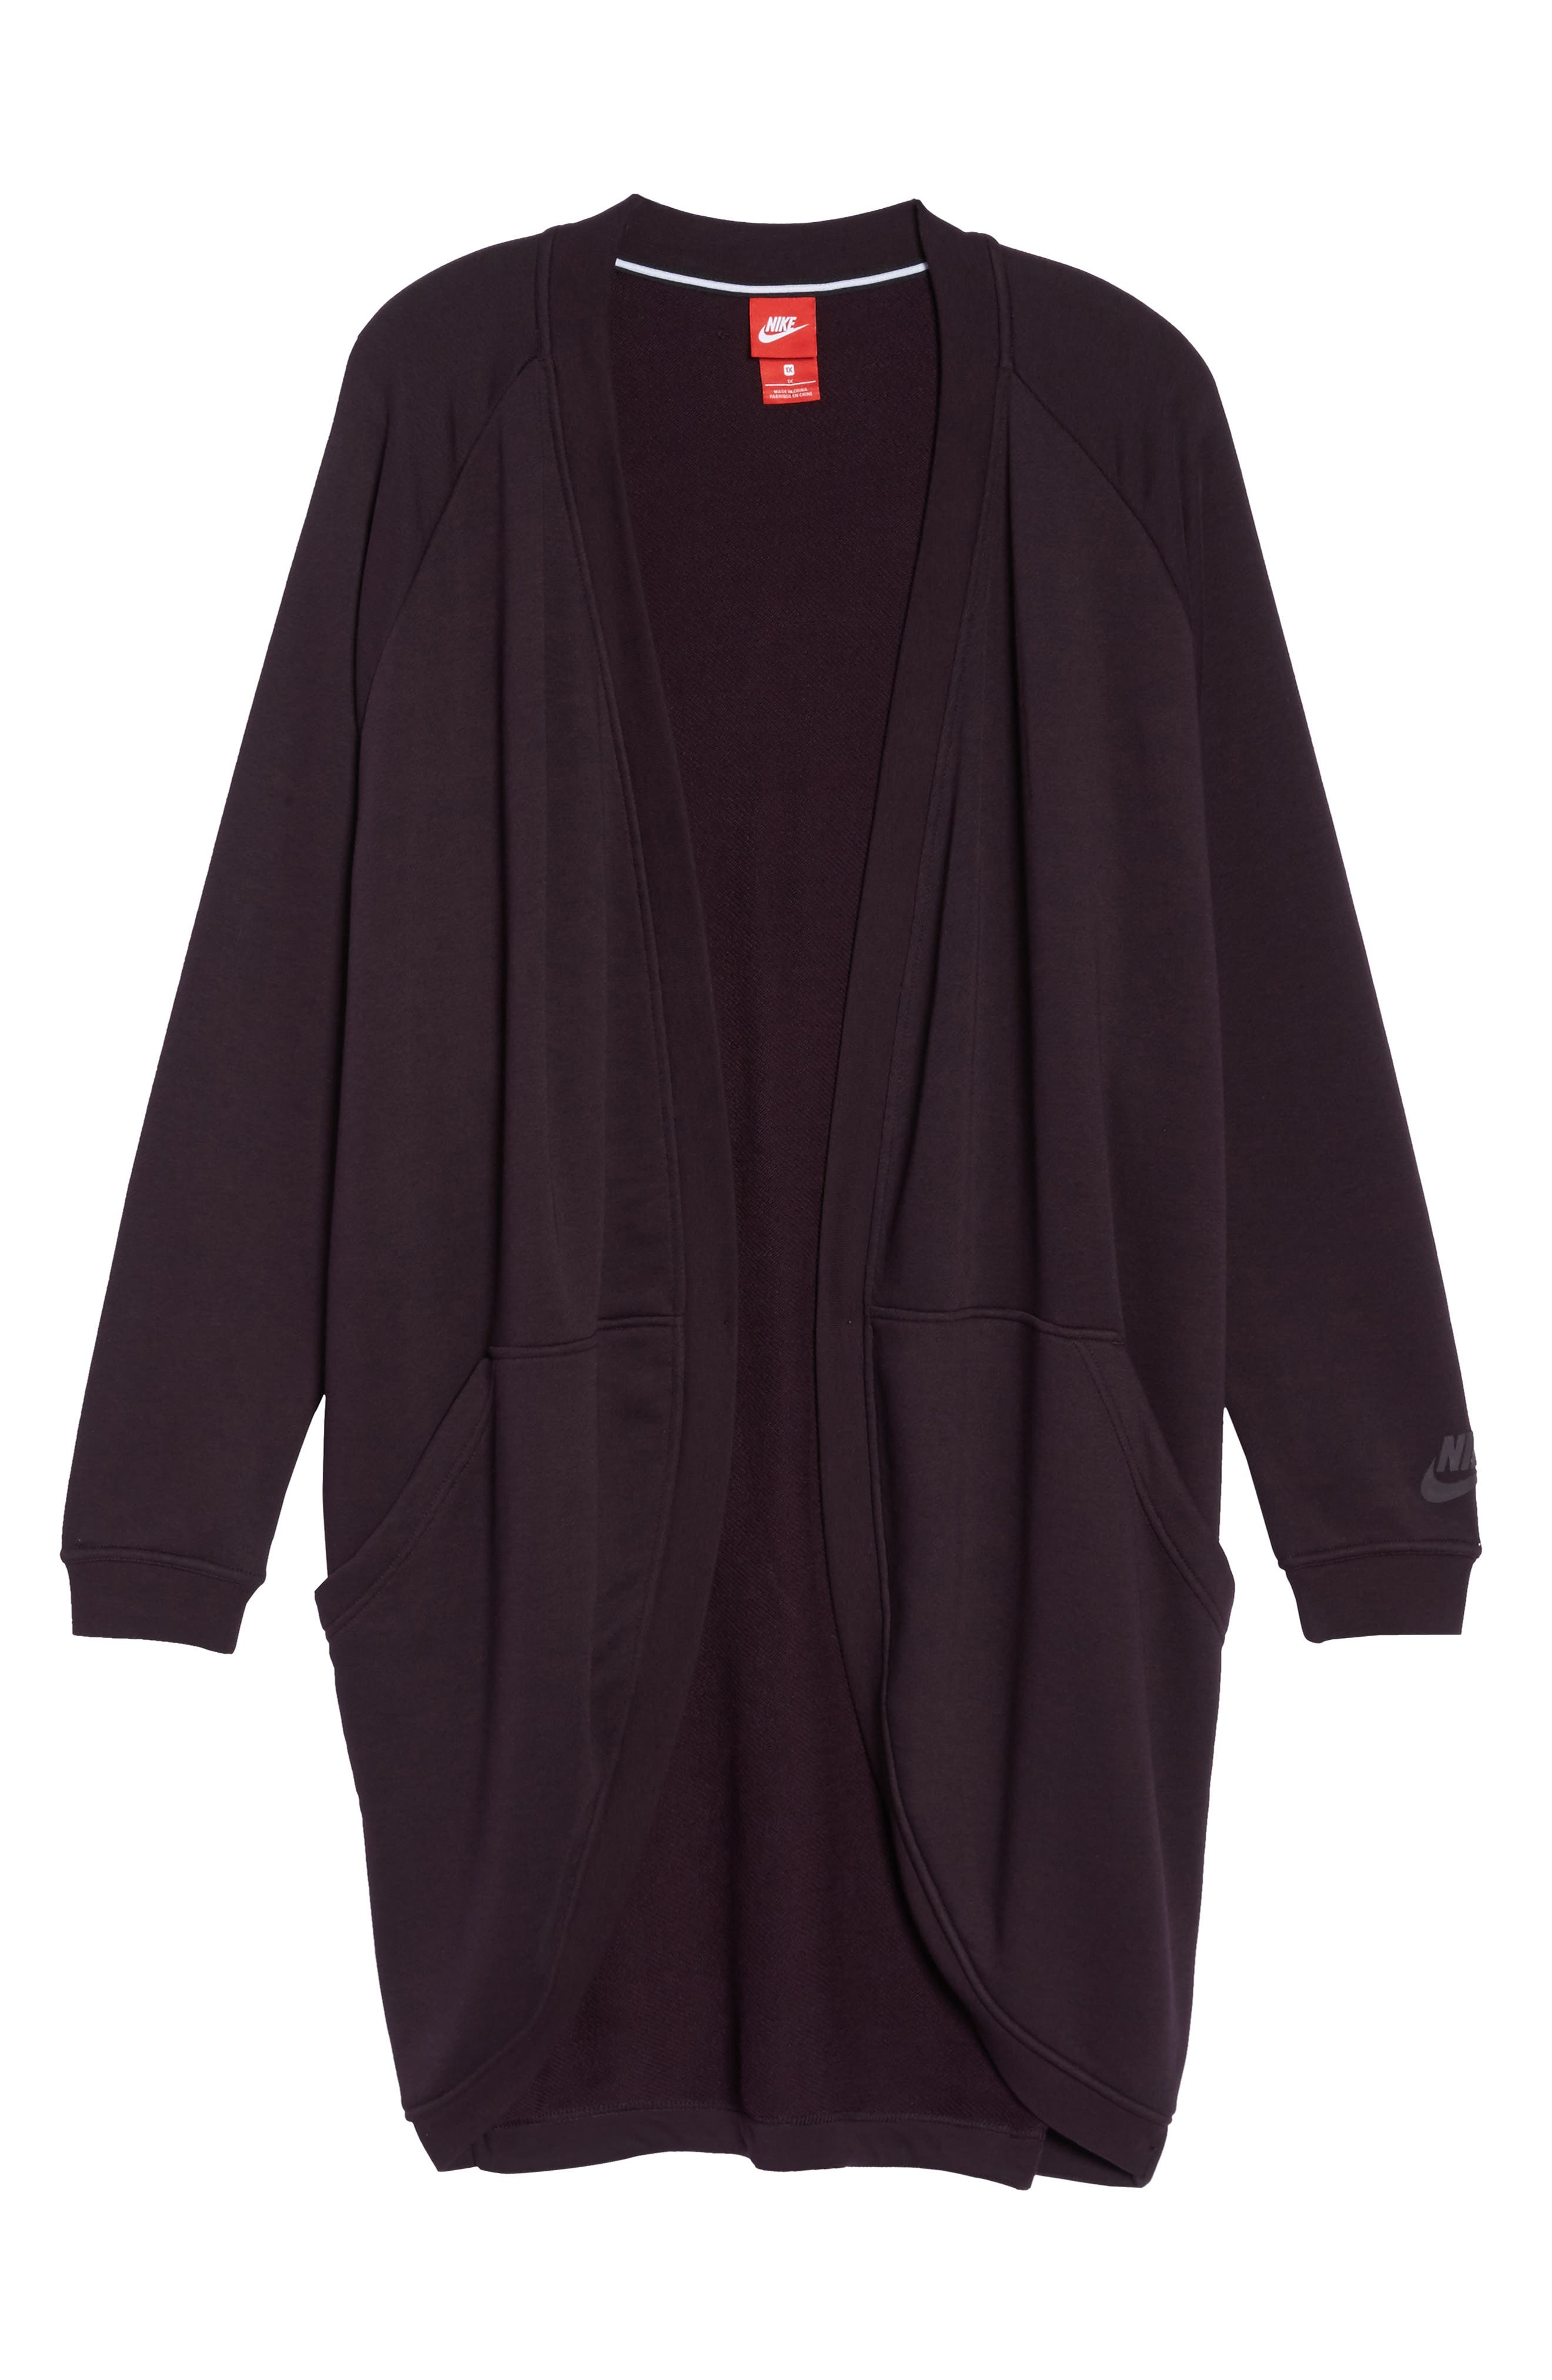 Sportswear Modern Cardigan,                             Alternate thumbnail 5, color,                             Port Wine/ Port Wine